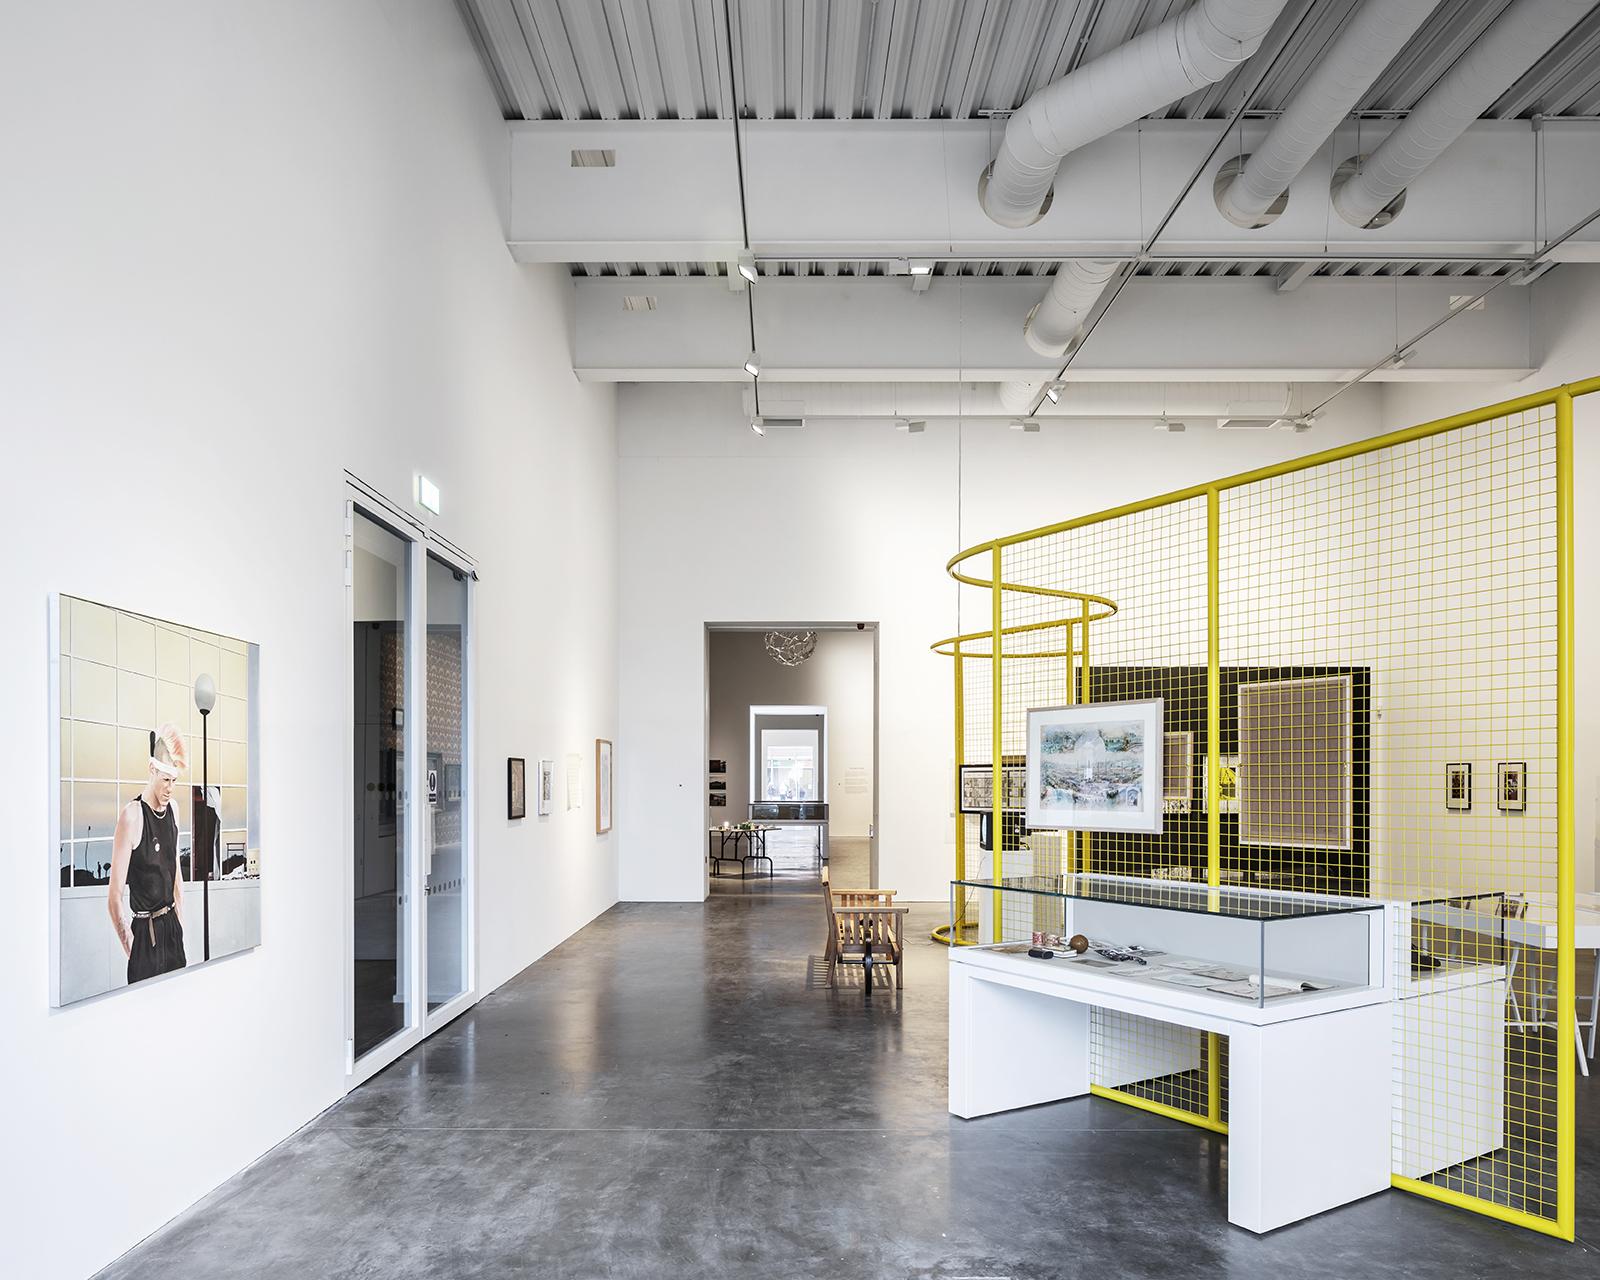 34_MK-Gallery-photo-Johan Dehlin.jpg